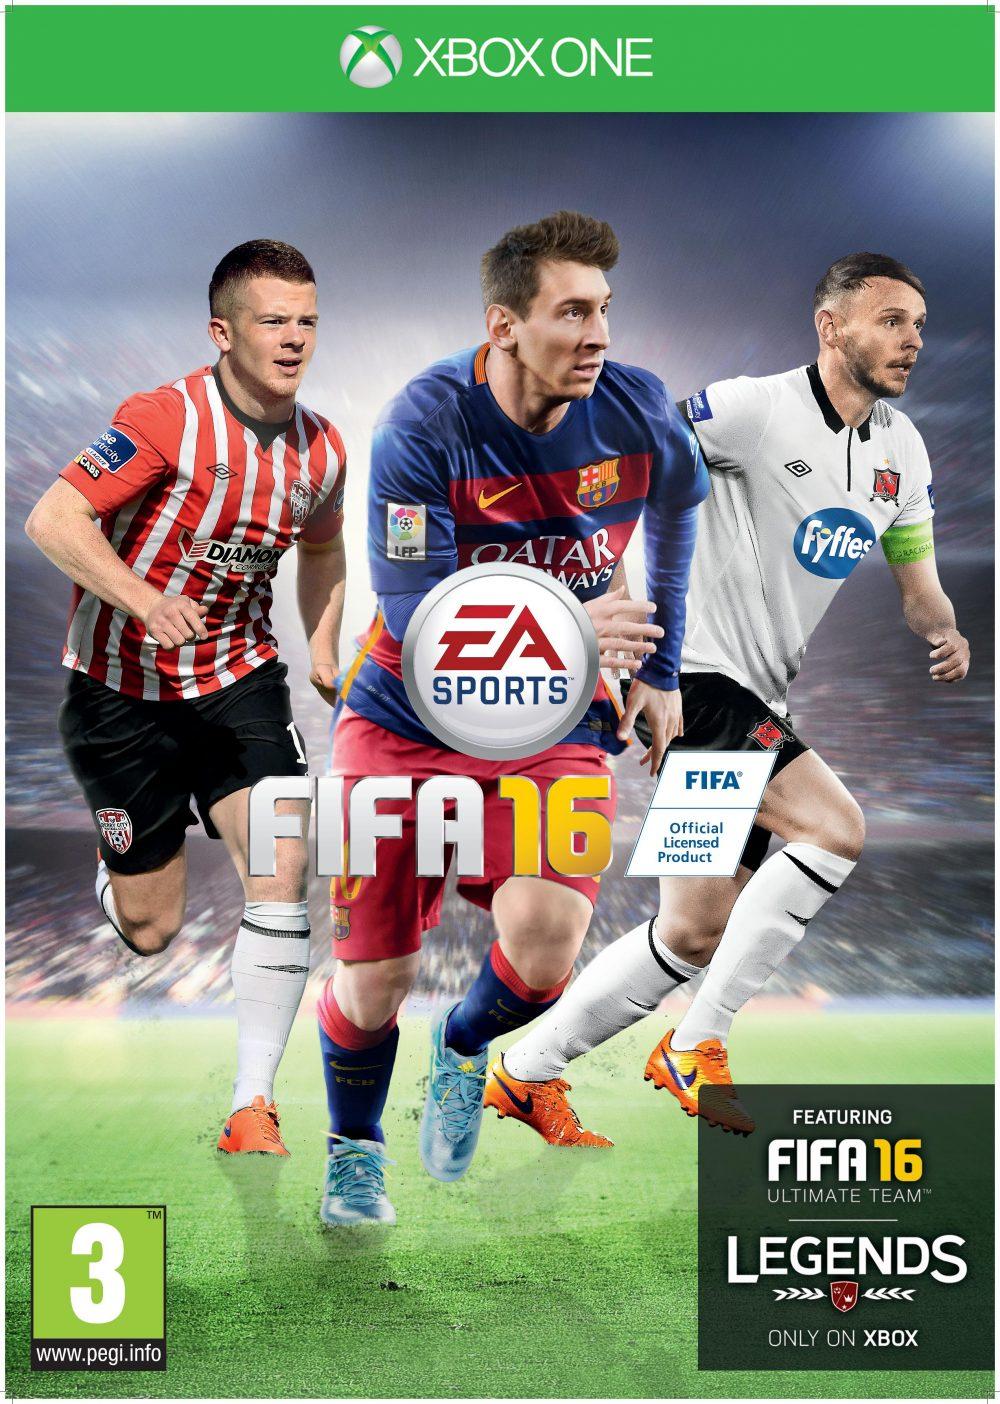 FIFA16, Xbox